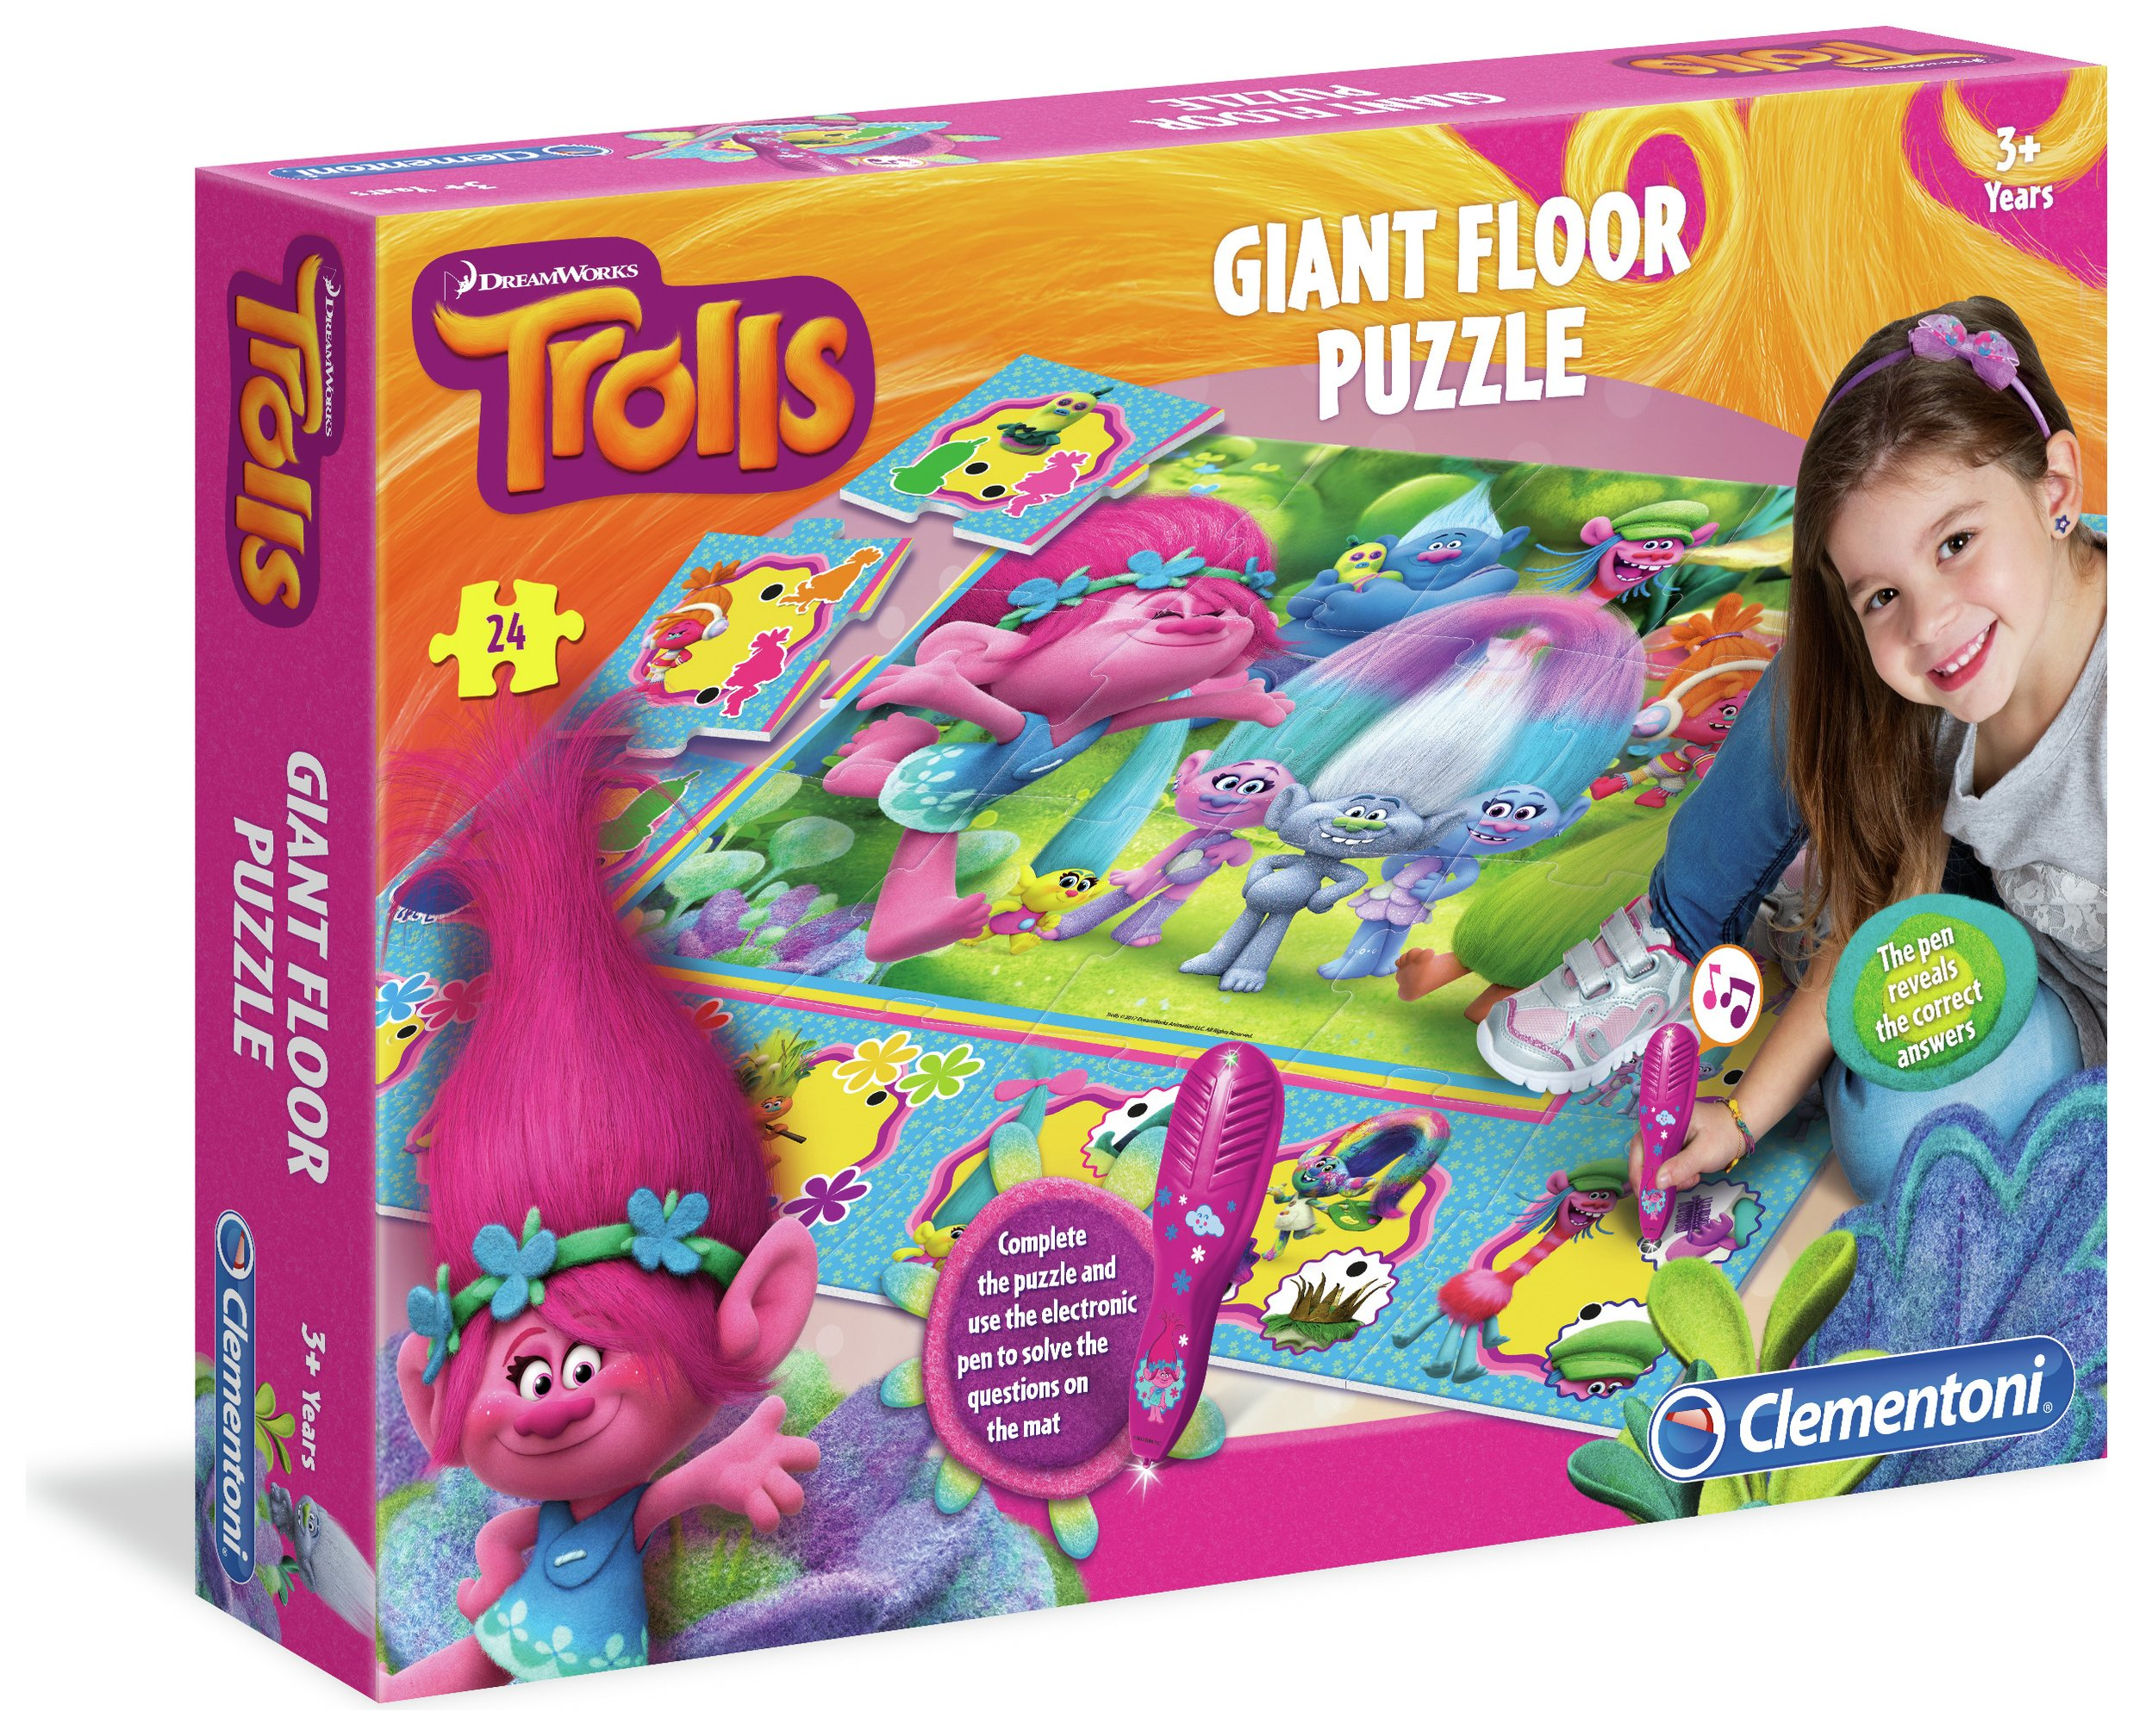 Image of Clementoni Dreamworks Trolls Giant Floor Puzzle